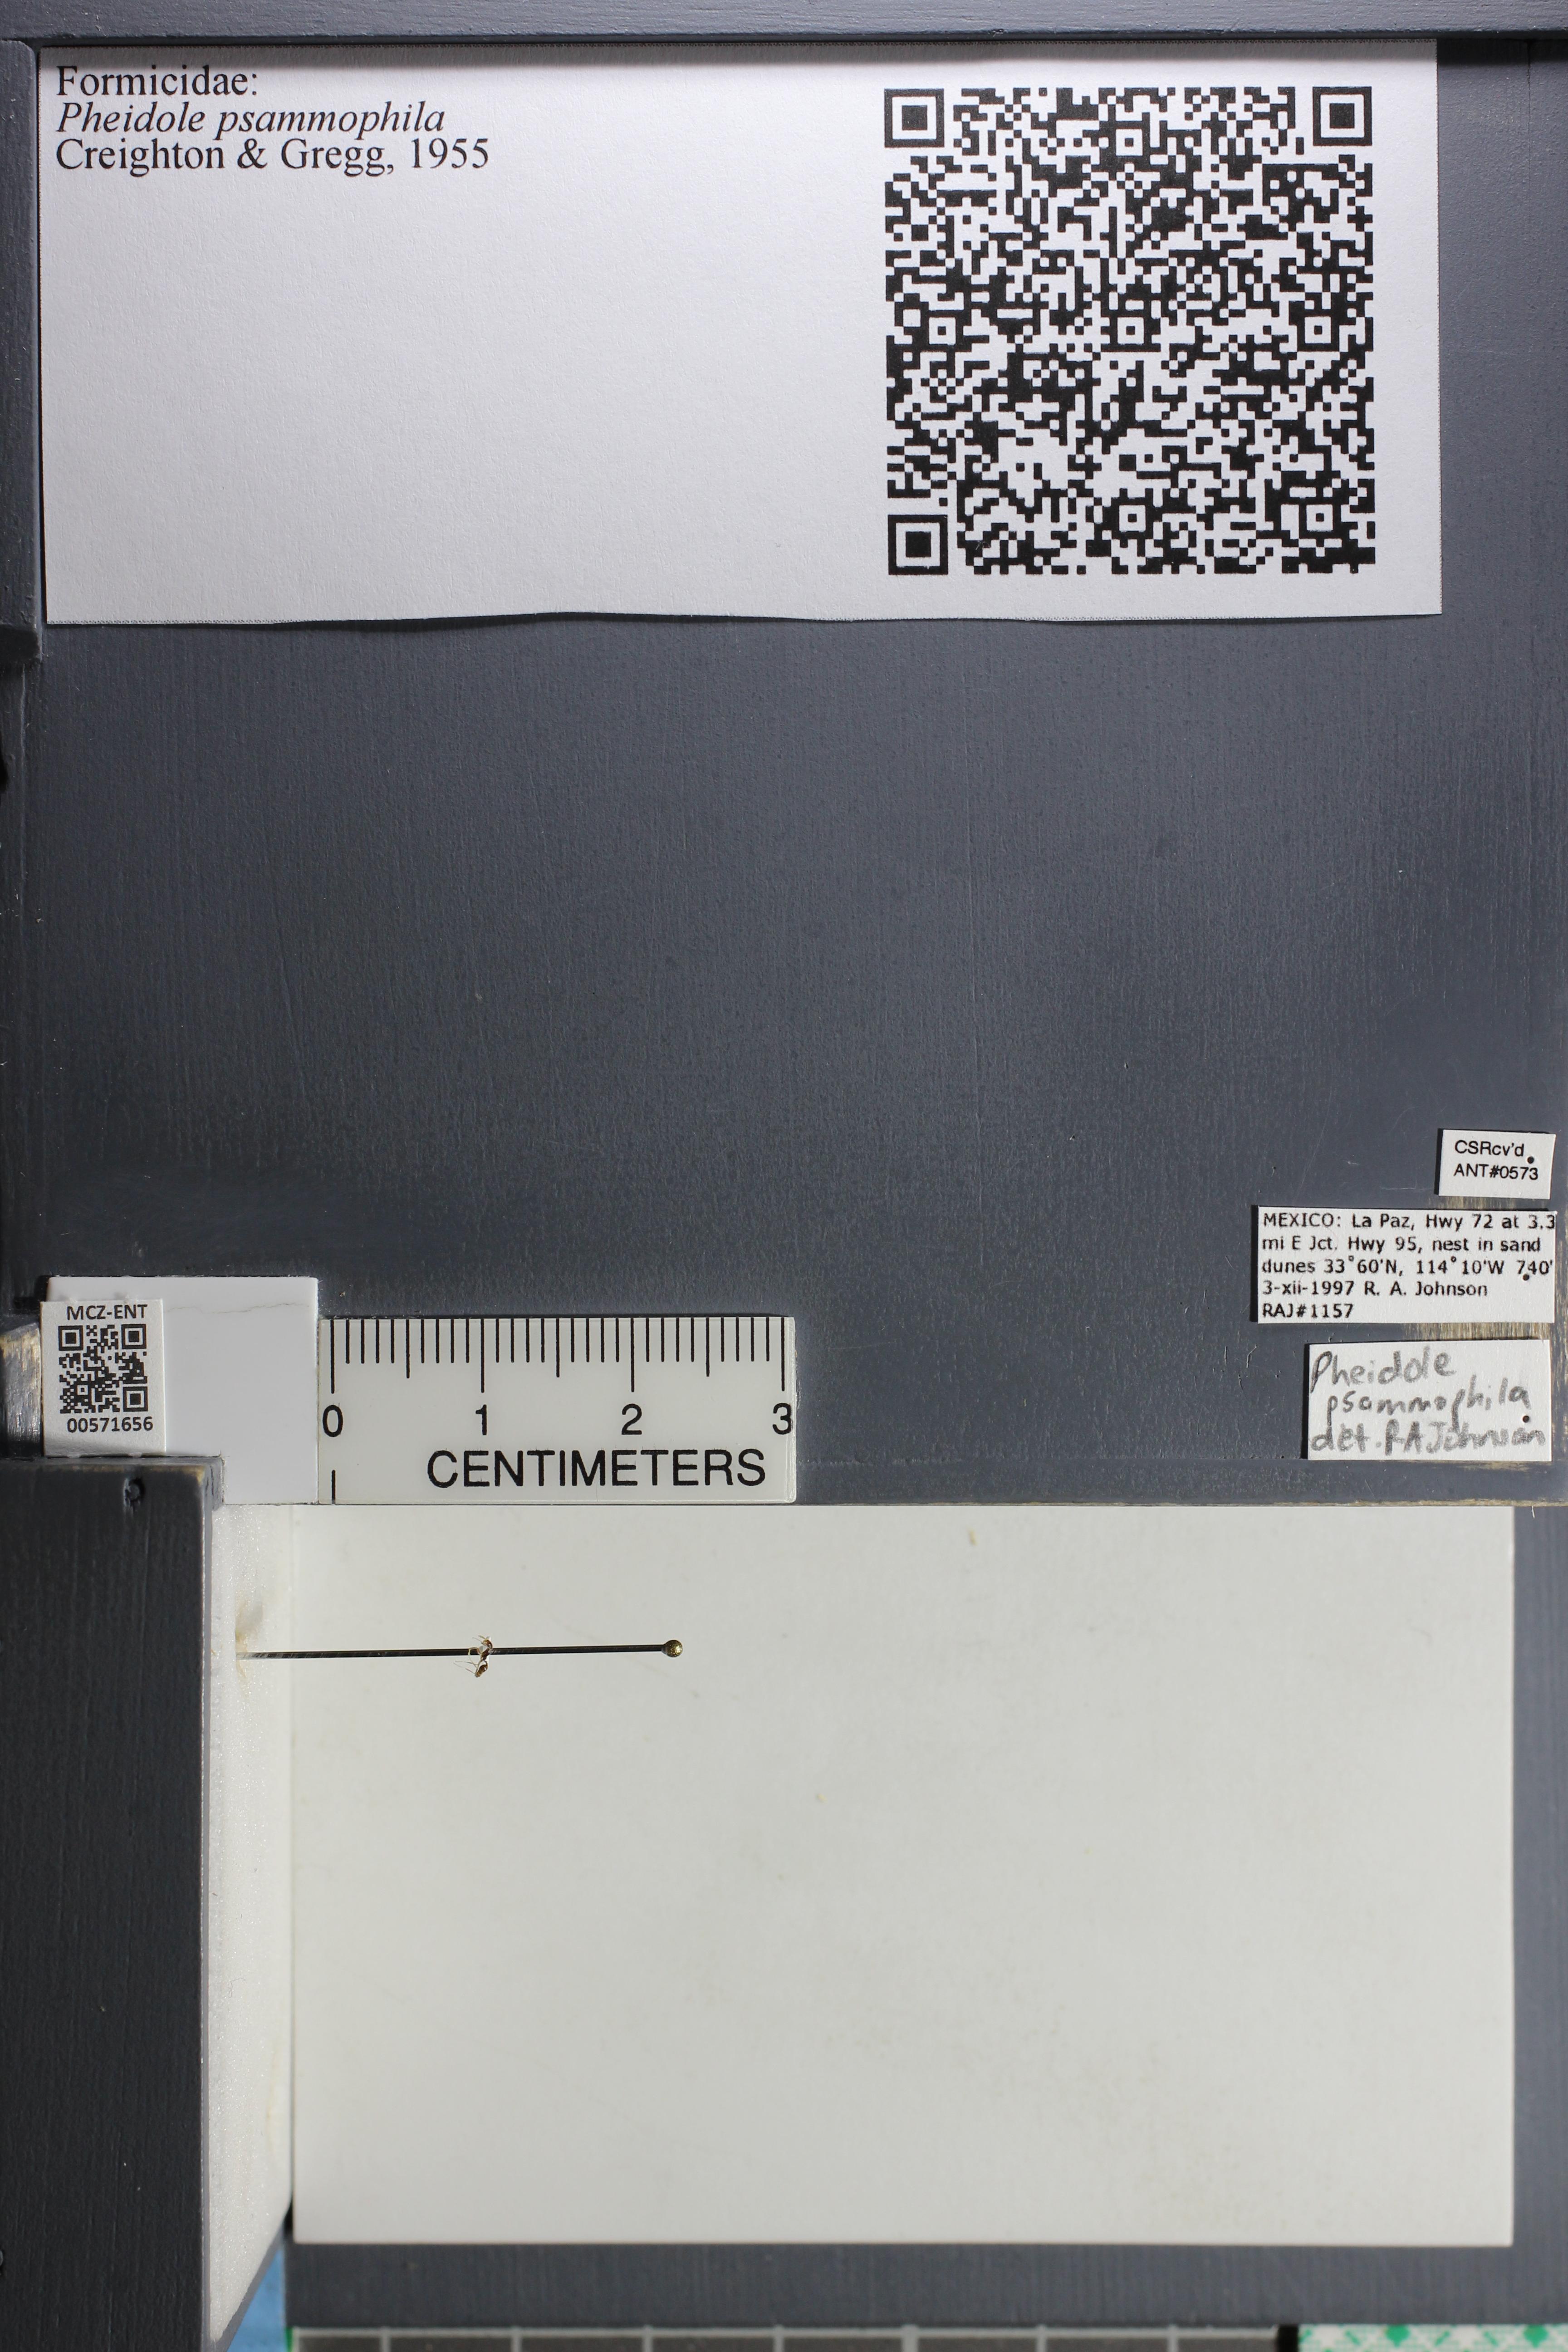 Media of type image, MCZ:Ent:571656 Identified as Pheidole psammophila.